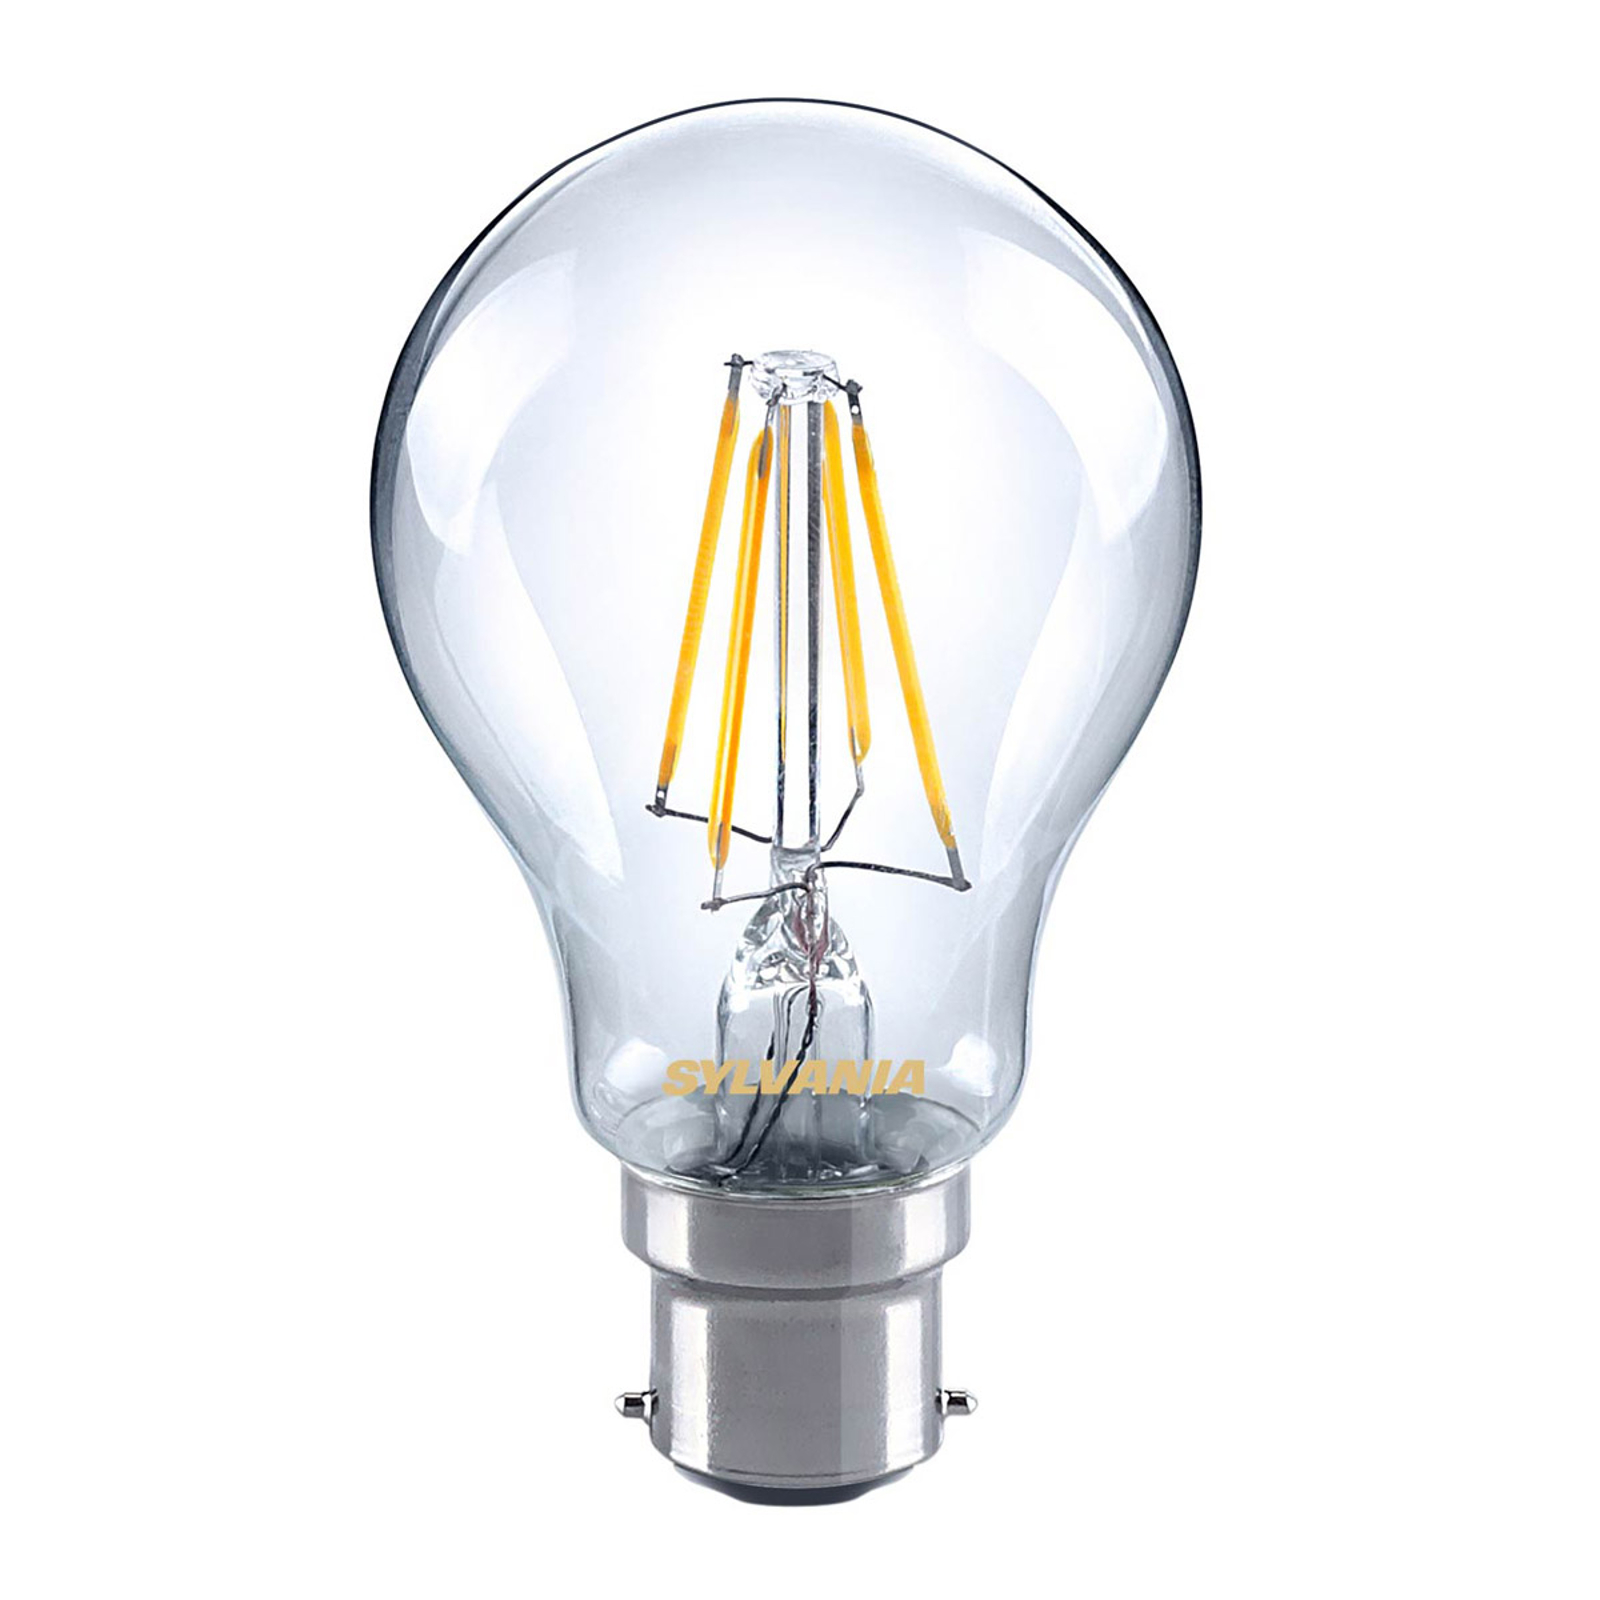 Lampadina a filamento LED 827 B22 4W chiara